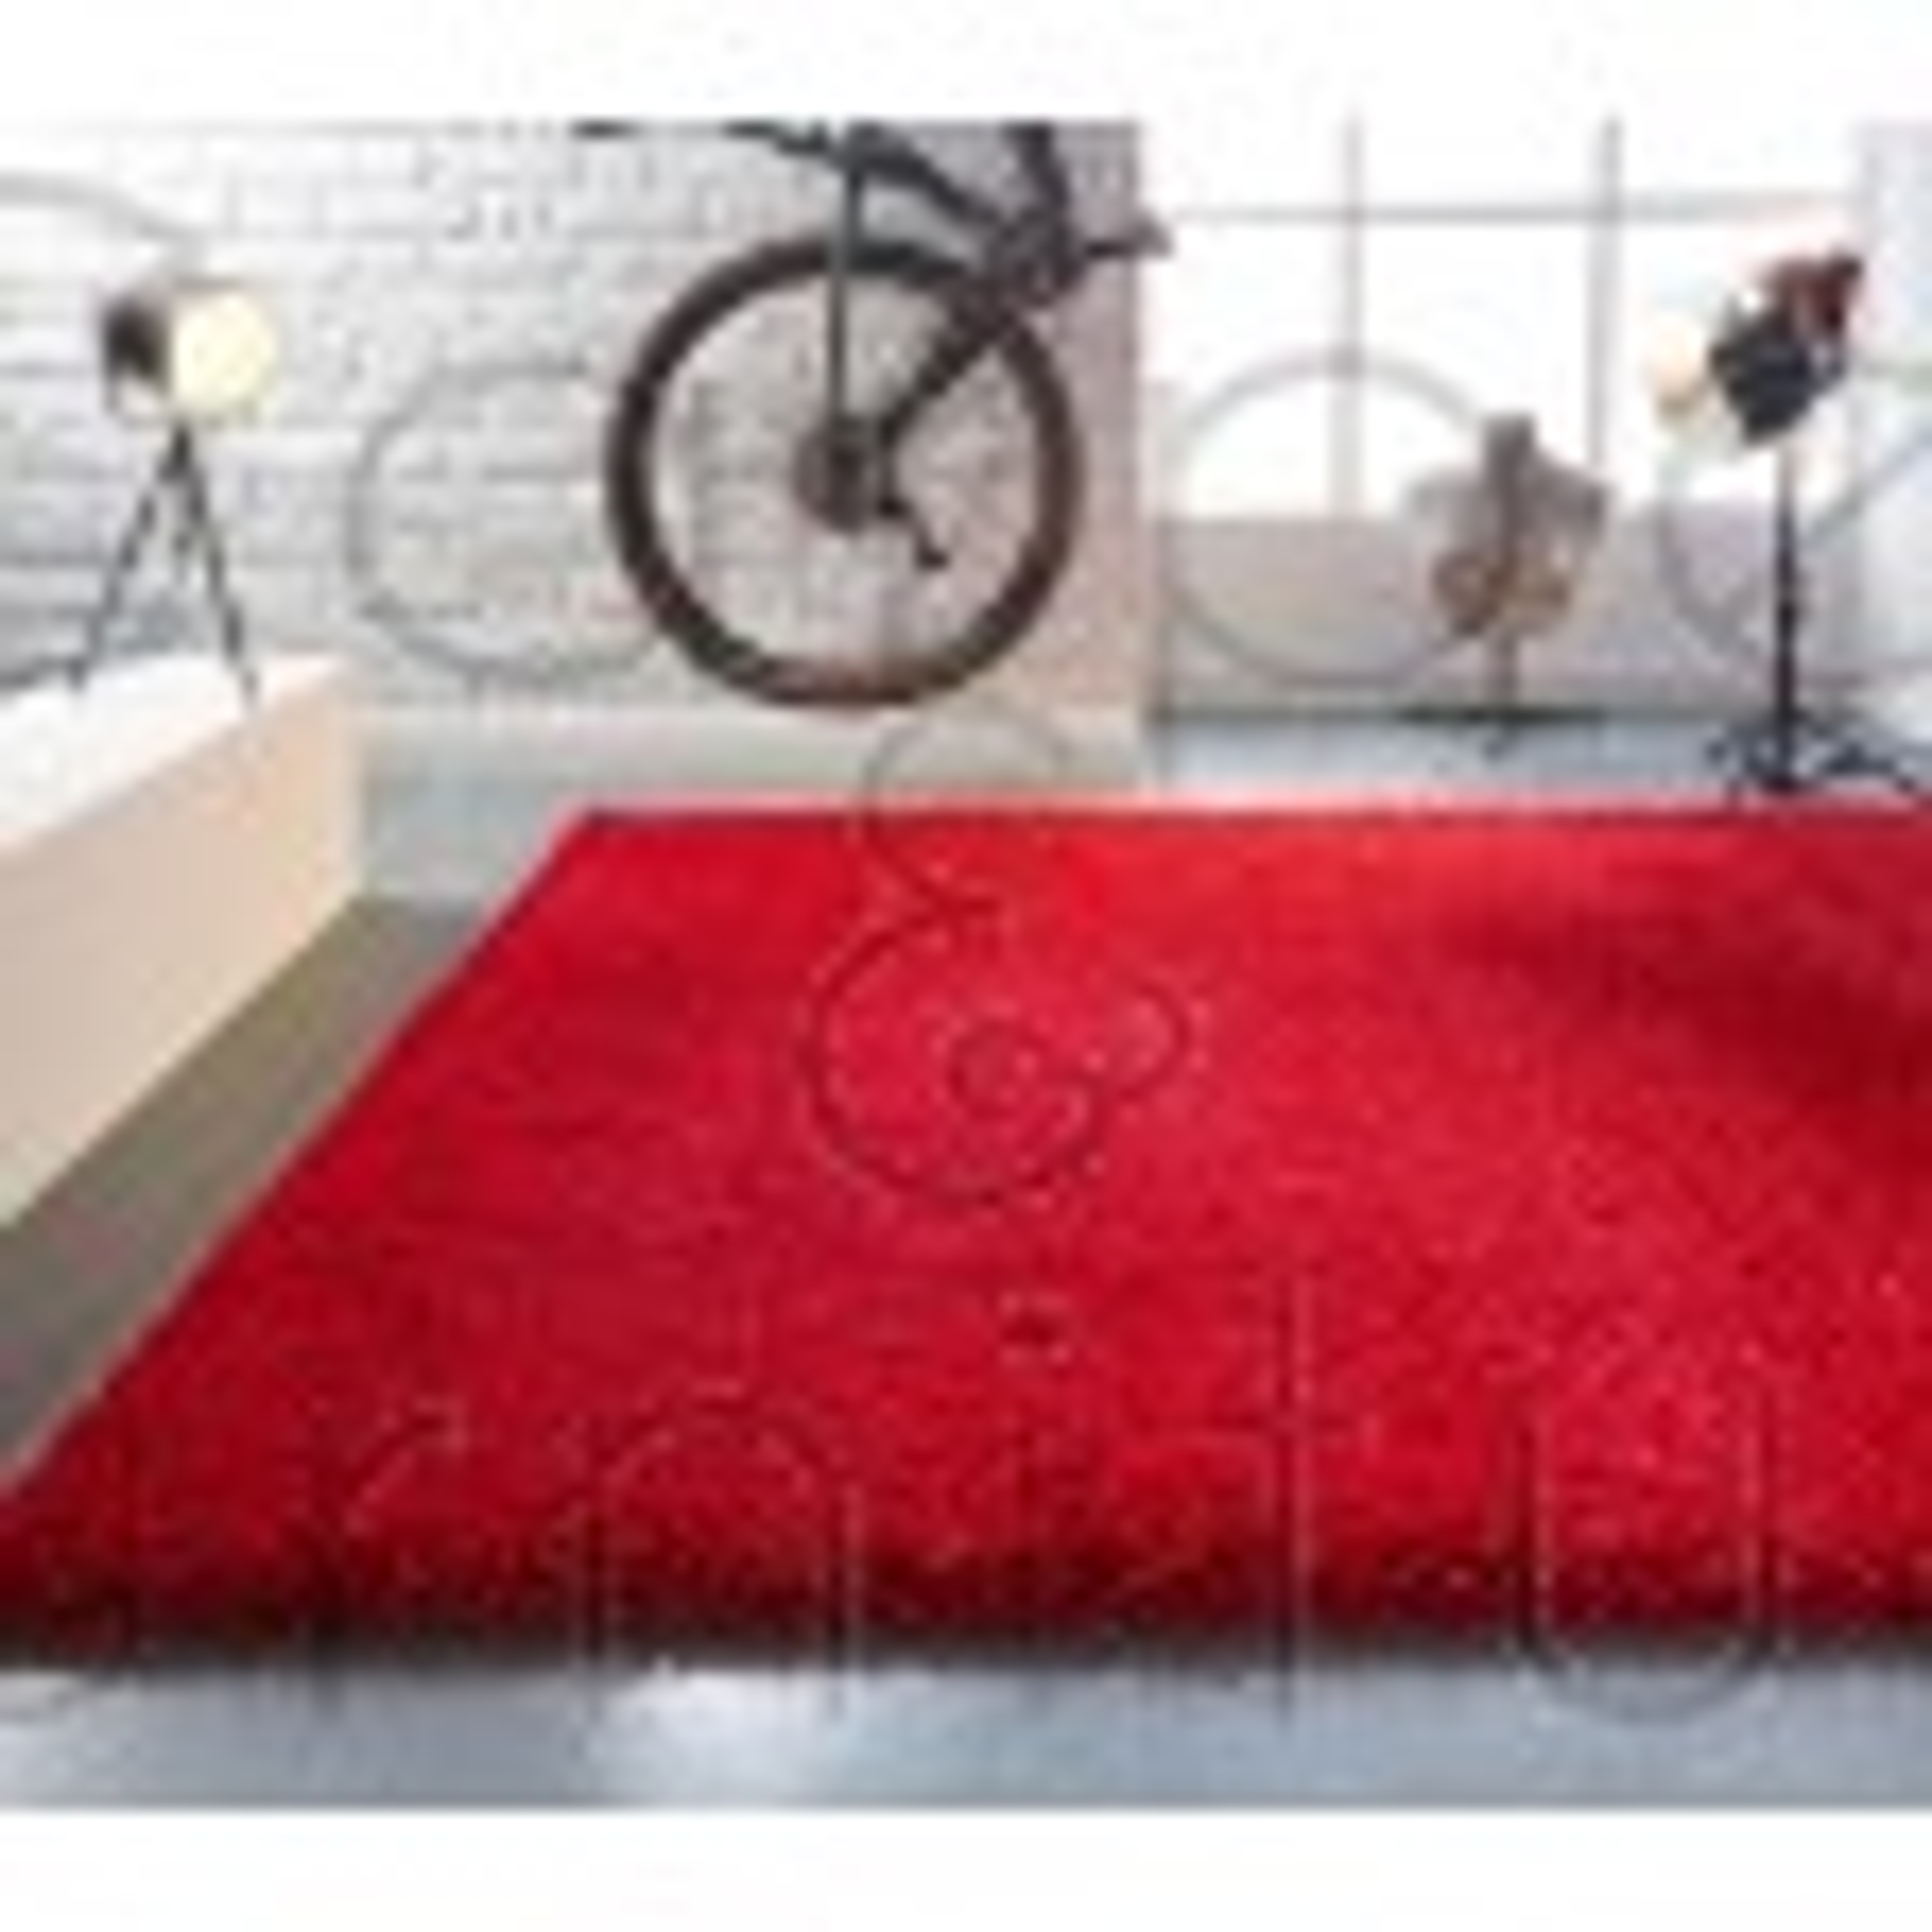 "Athena Shaggy Rug - Red - Size 80 x 150 cm (2'8"" x 5')"